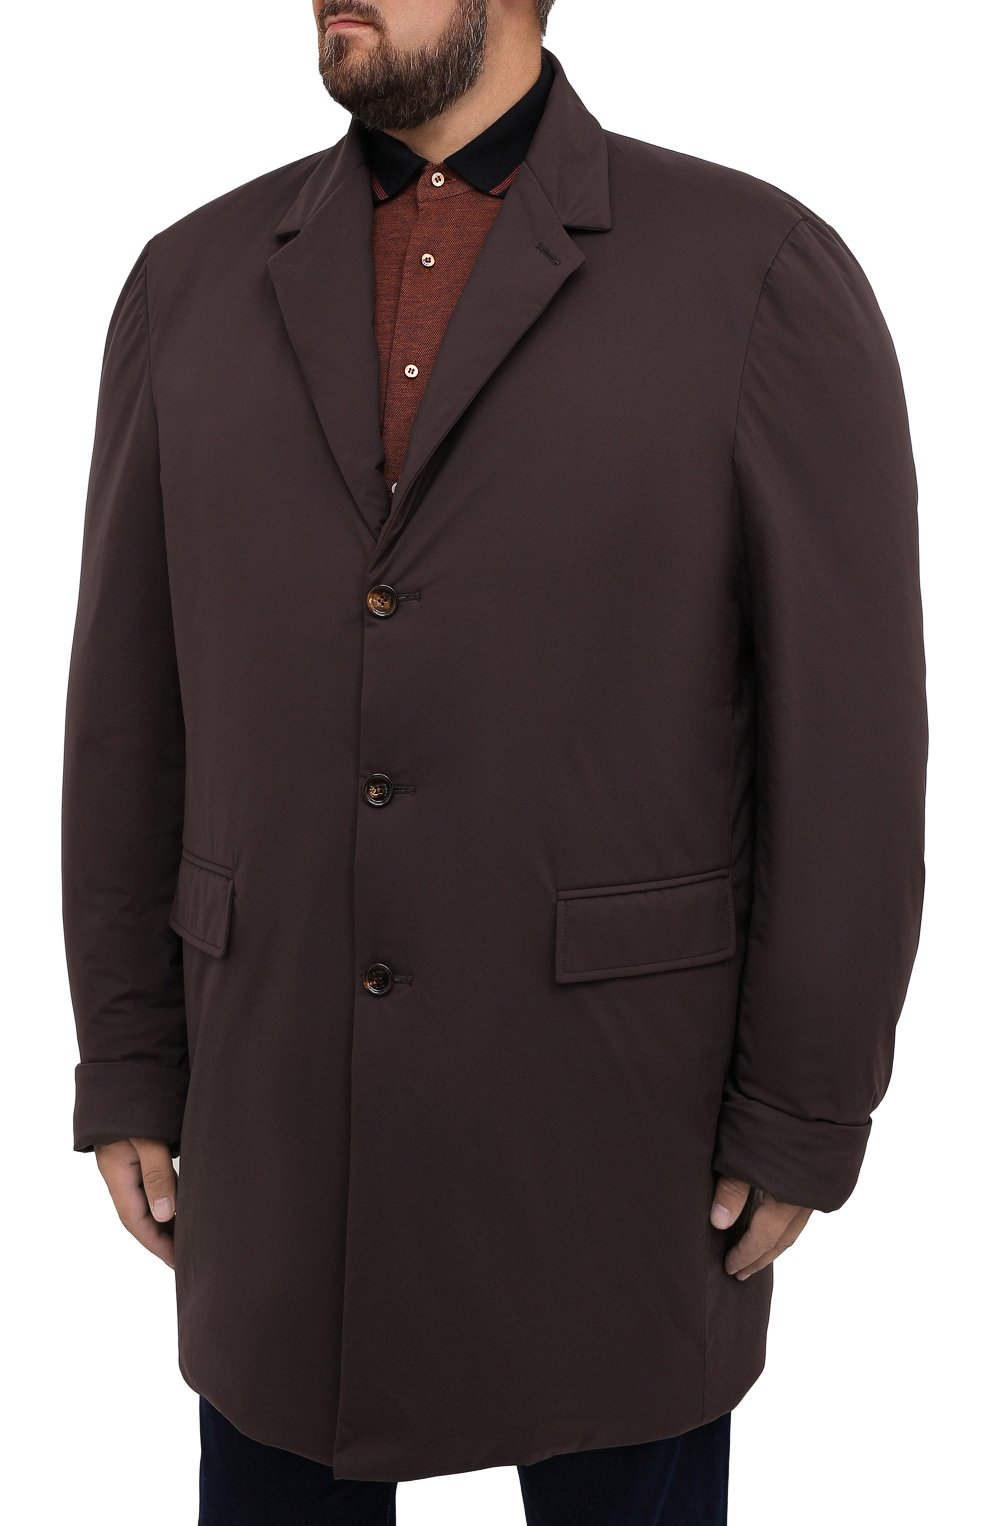 Мужской пуховый плащ KIRED коричневого цвета, арт. WPELM0LW6806527000/62-72 | Фото 3